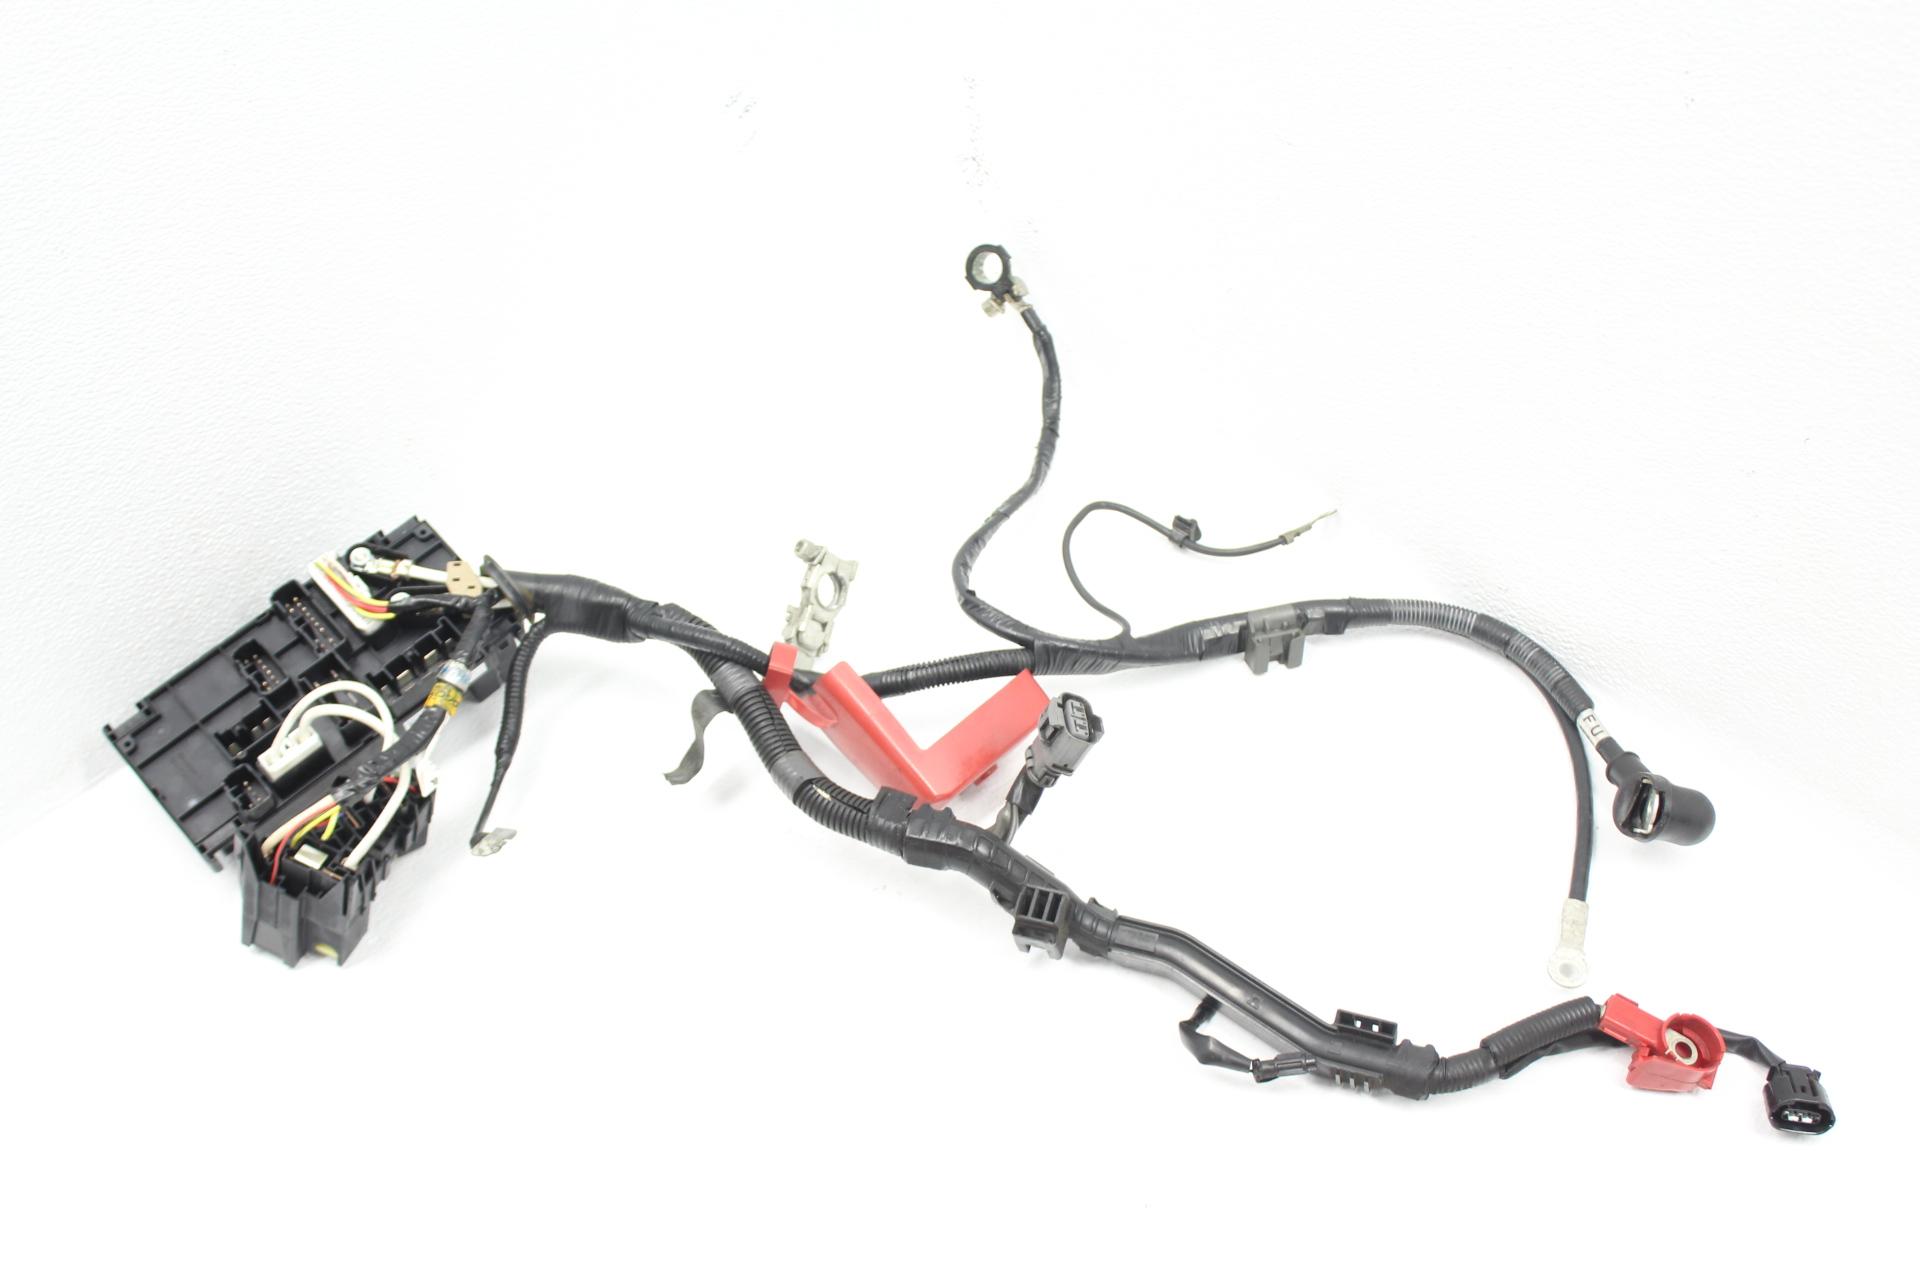 2015-2020 SUBARU WRX STI BATTERY CABLE HARNESS OEM